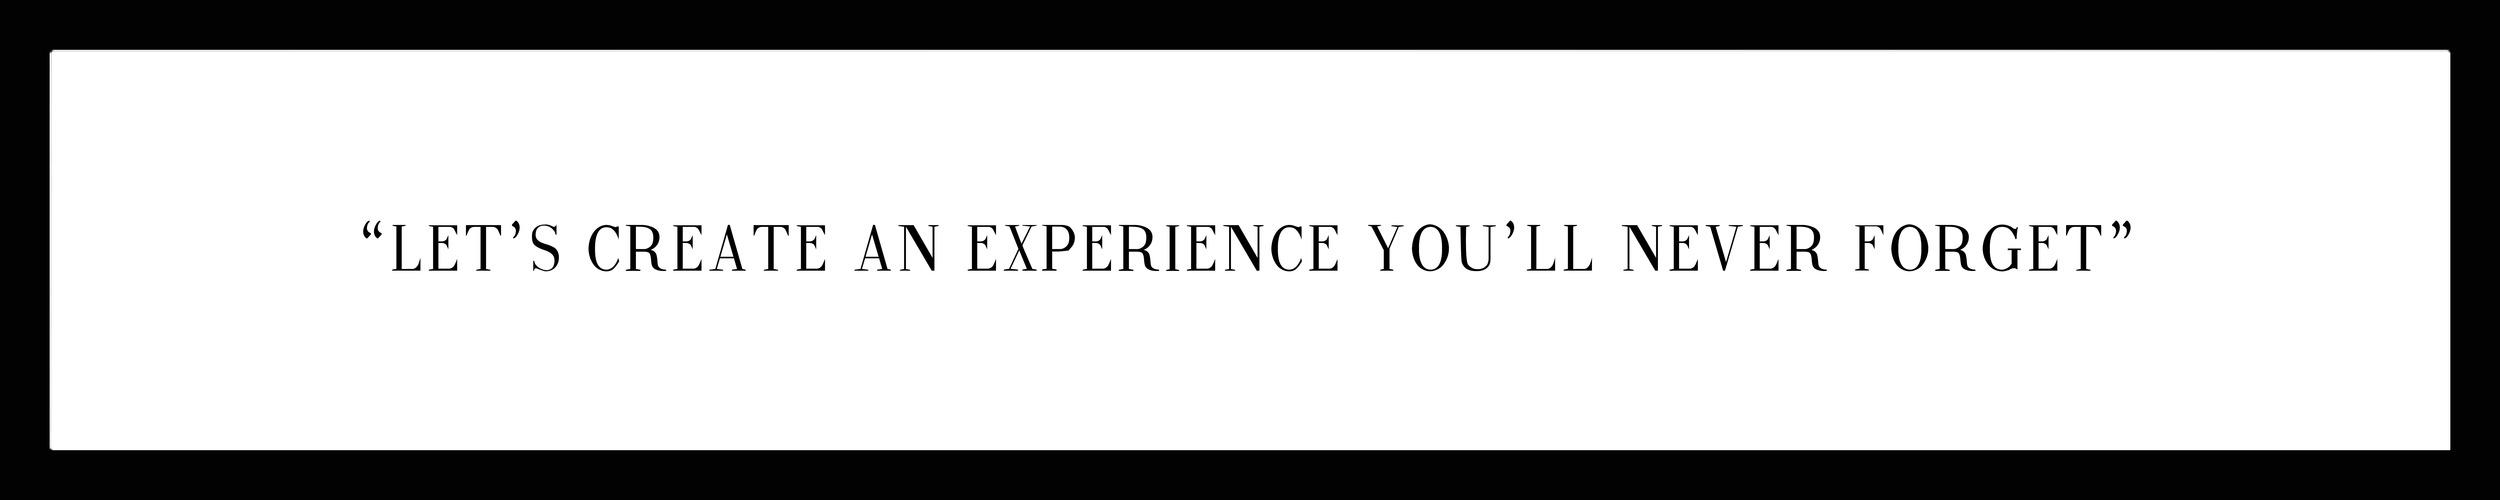 experienceCorrect.jpg